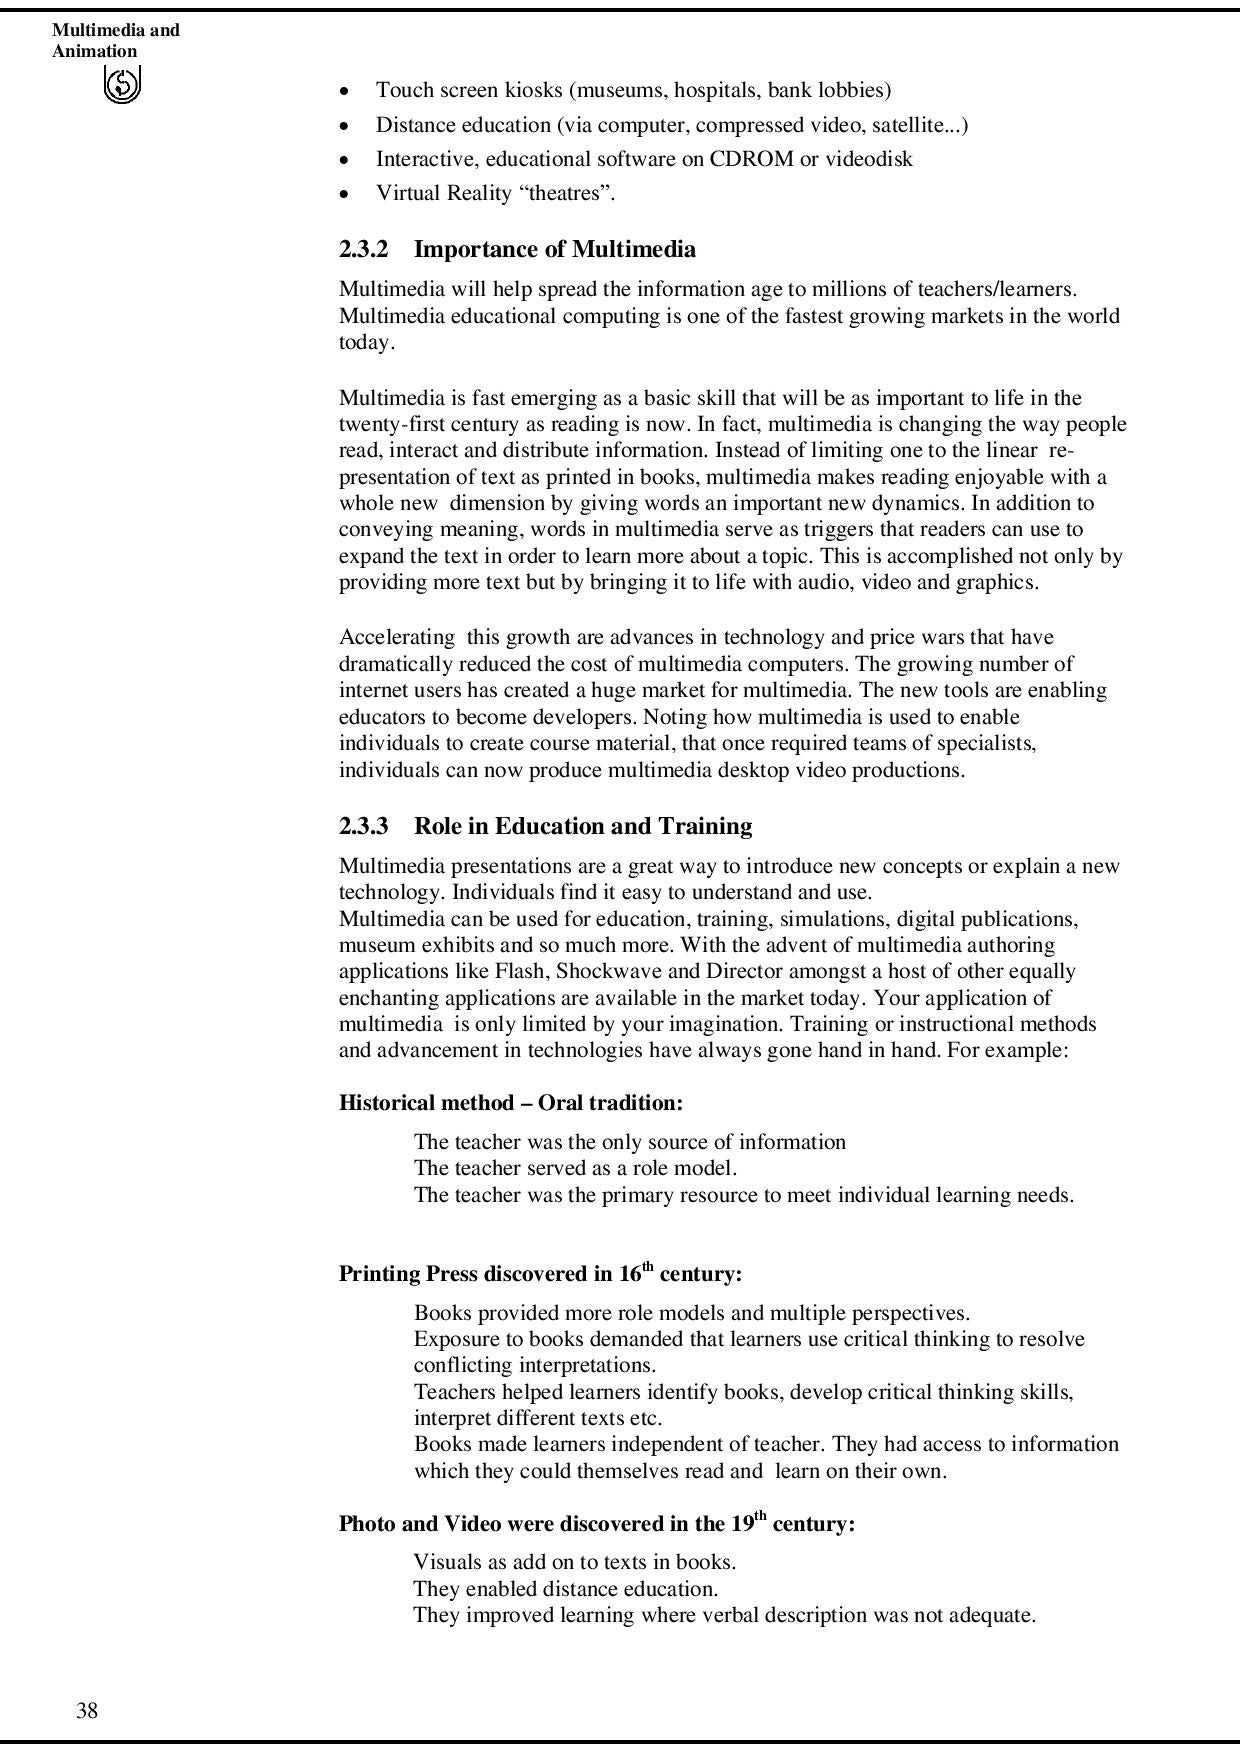 overseas studies essay rubric middle school